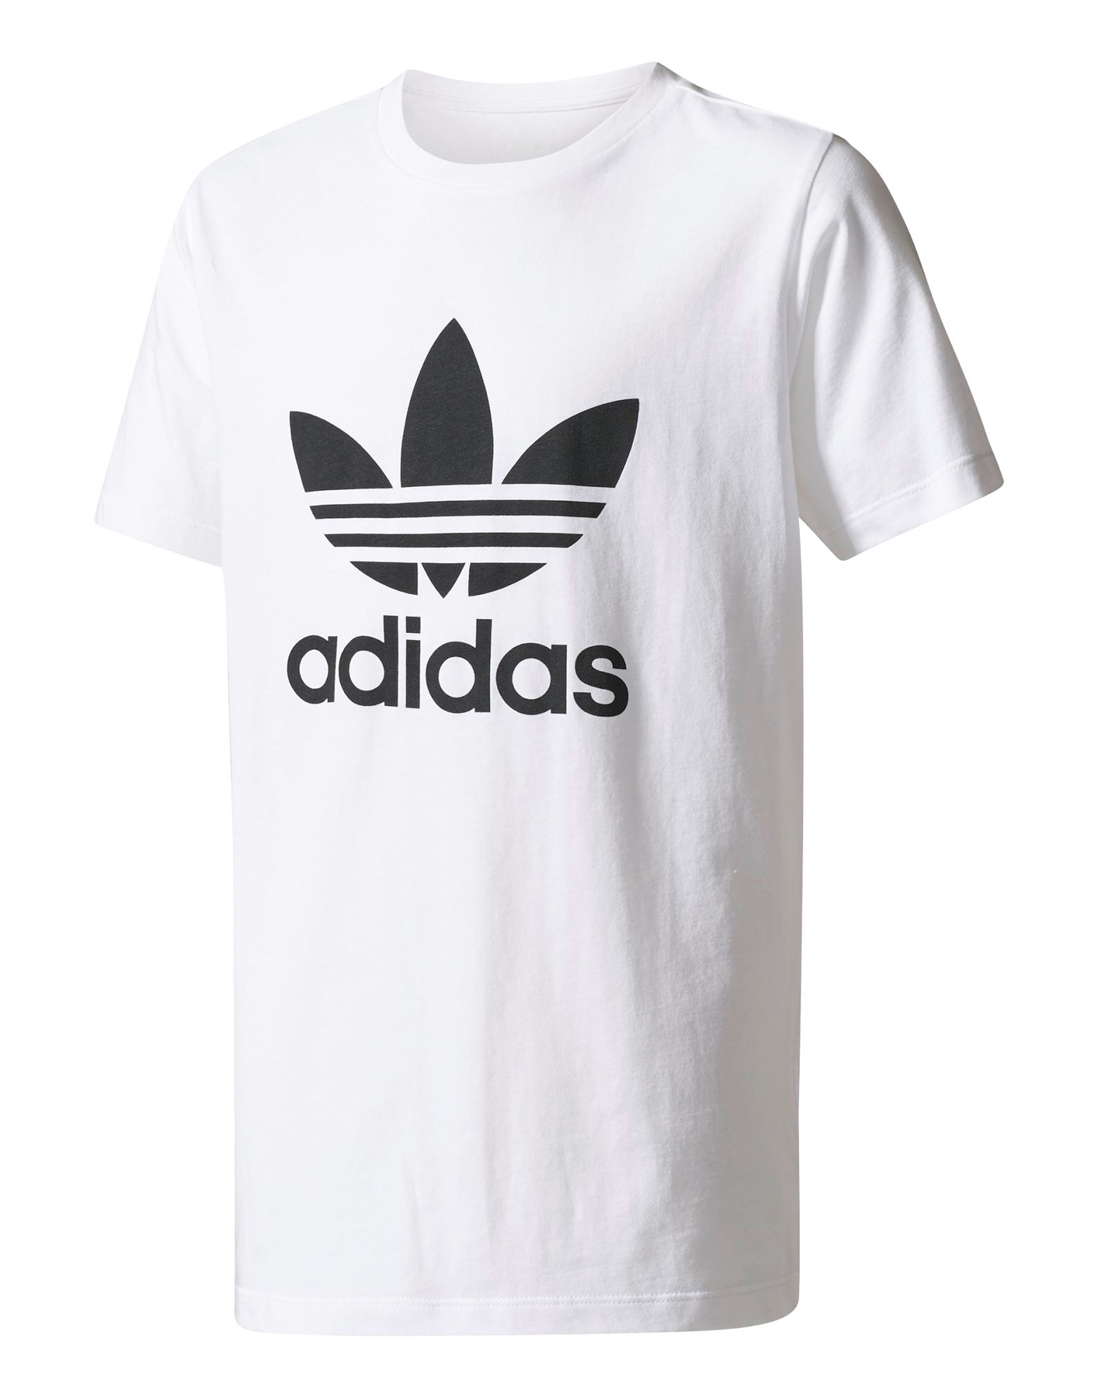 462b3c2f58d26 adidas Originals Older Girls Originals Trefoil T-Shirt | Life Style ...